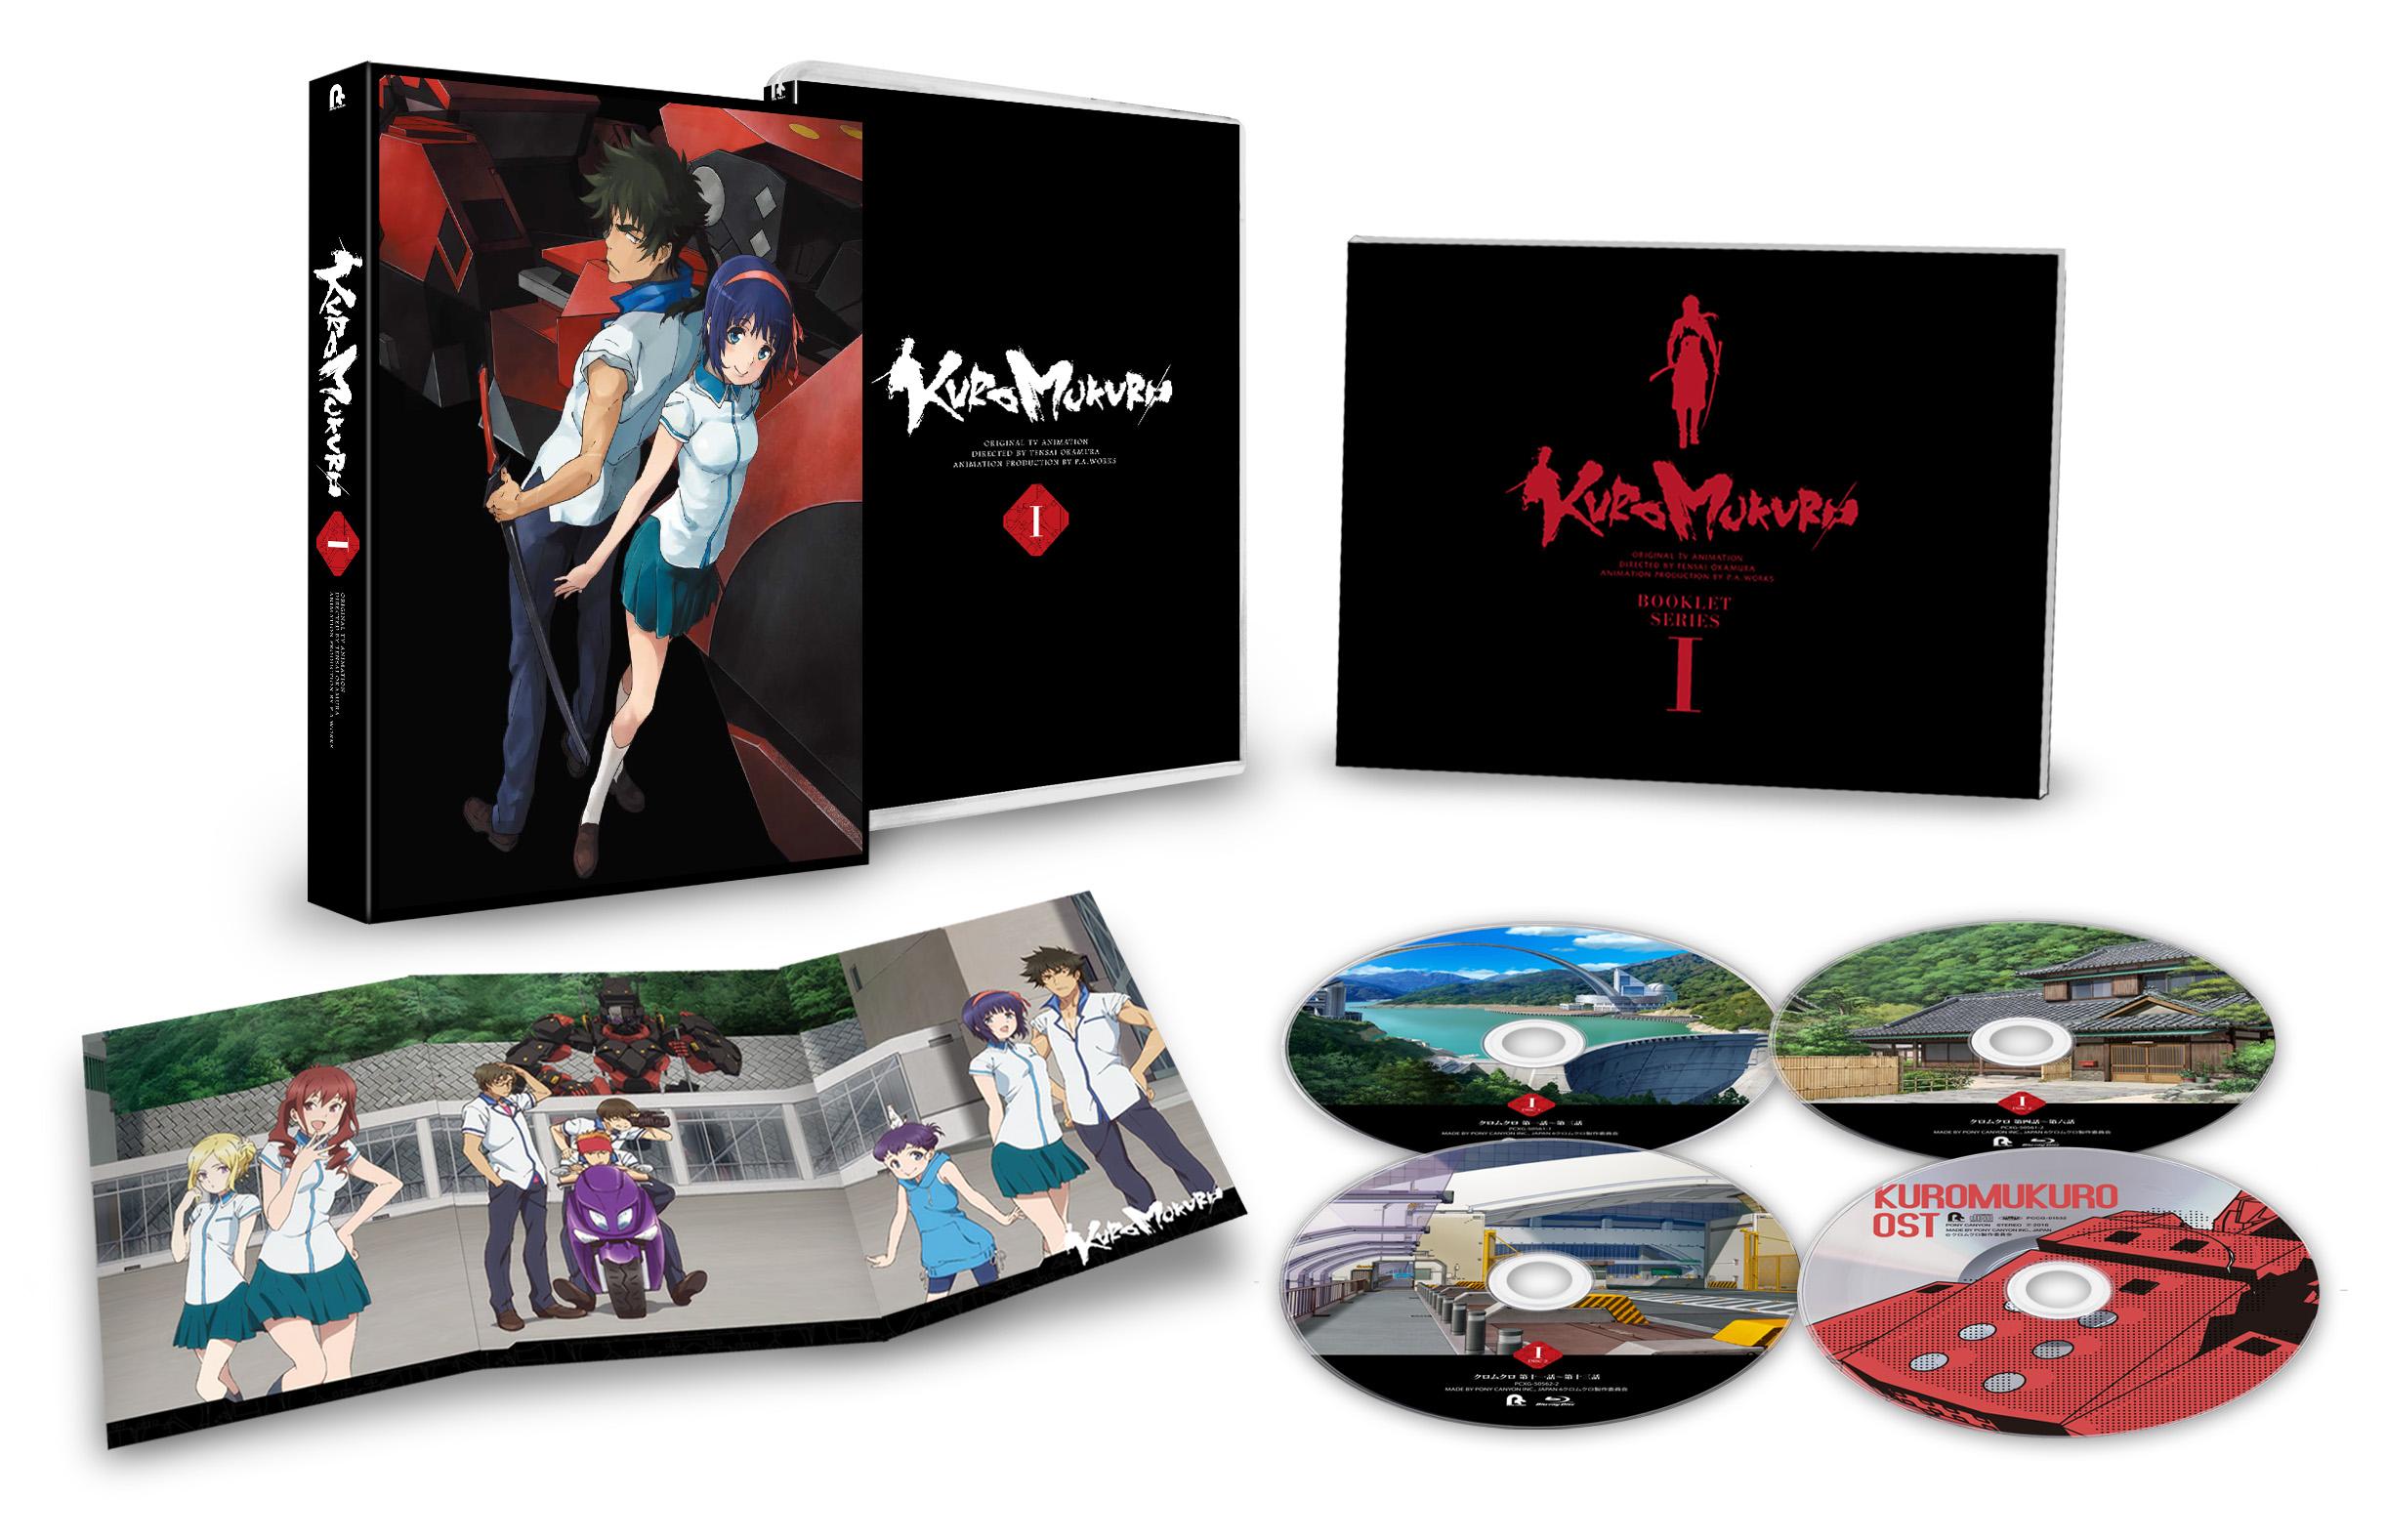 Kuromukuro Collector's Edition Volume 1 Blu-ray + GWP 742617600258gwp